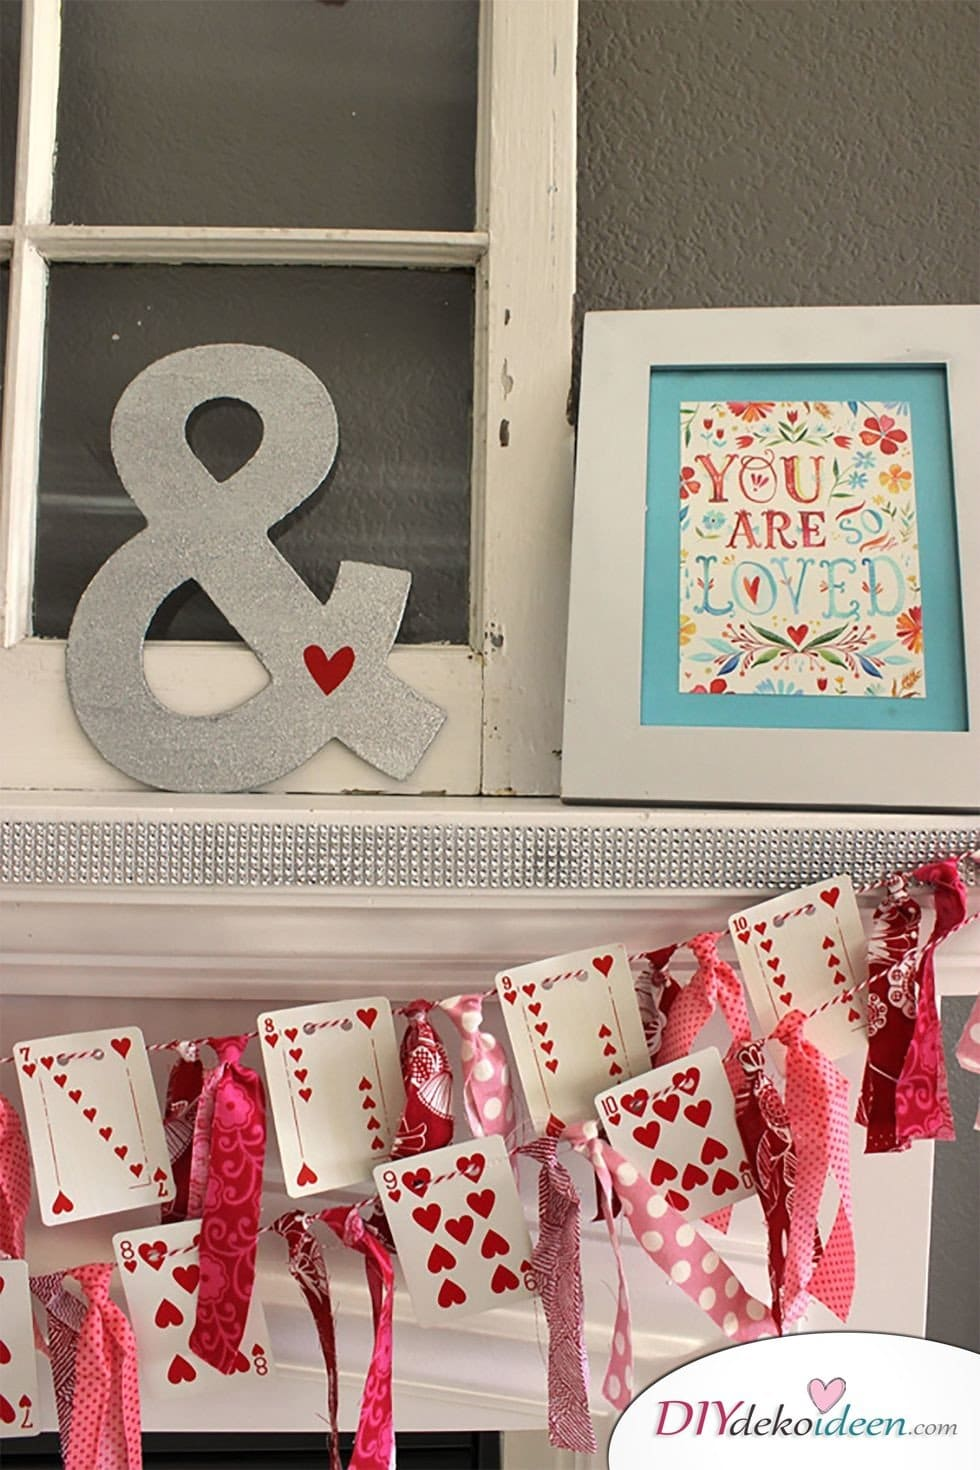 DIY Wanddeko, Kartengirlande, Valentinstag, Tischdeko, , Valentinstag Deko Ideen, Deko Valentinstag, dekorieren, DIY Dekoideen, Deko basteln, romantische Deko,